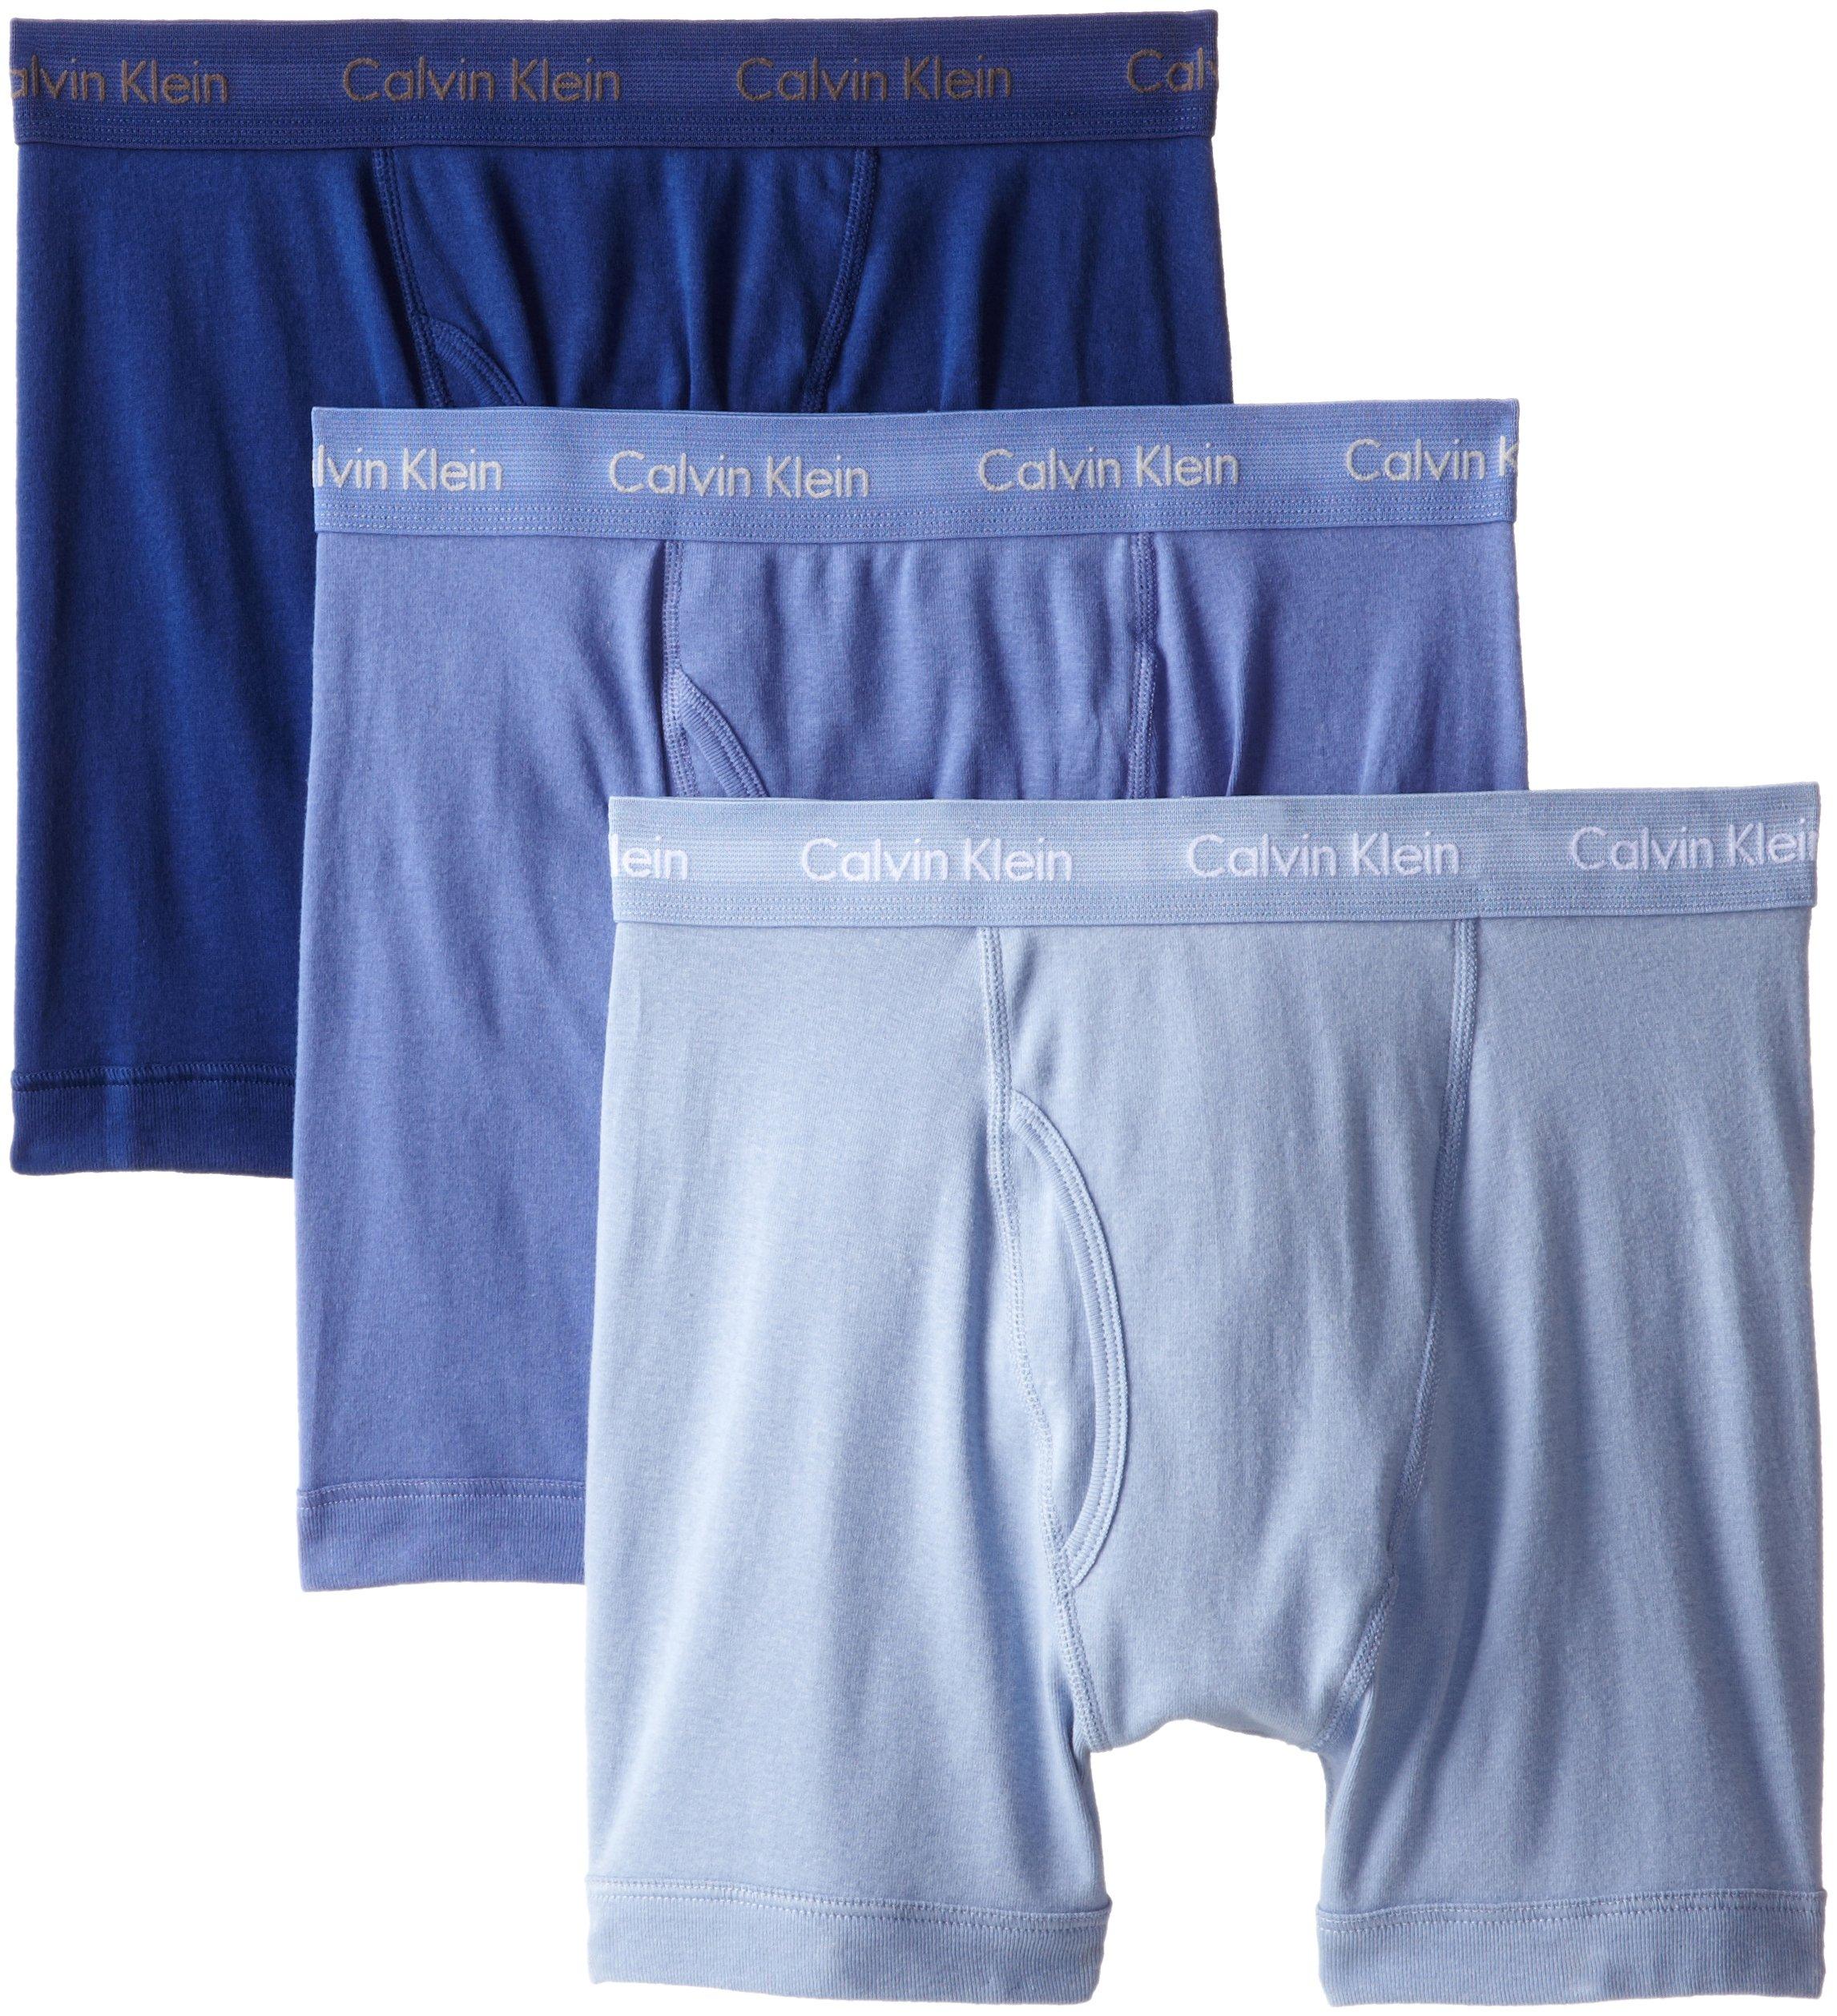 Calvin Klein Men's Underwear Cotton Classics Boxer Briefs - Medium - Blue Assorted (Pack of 3)